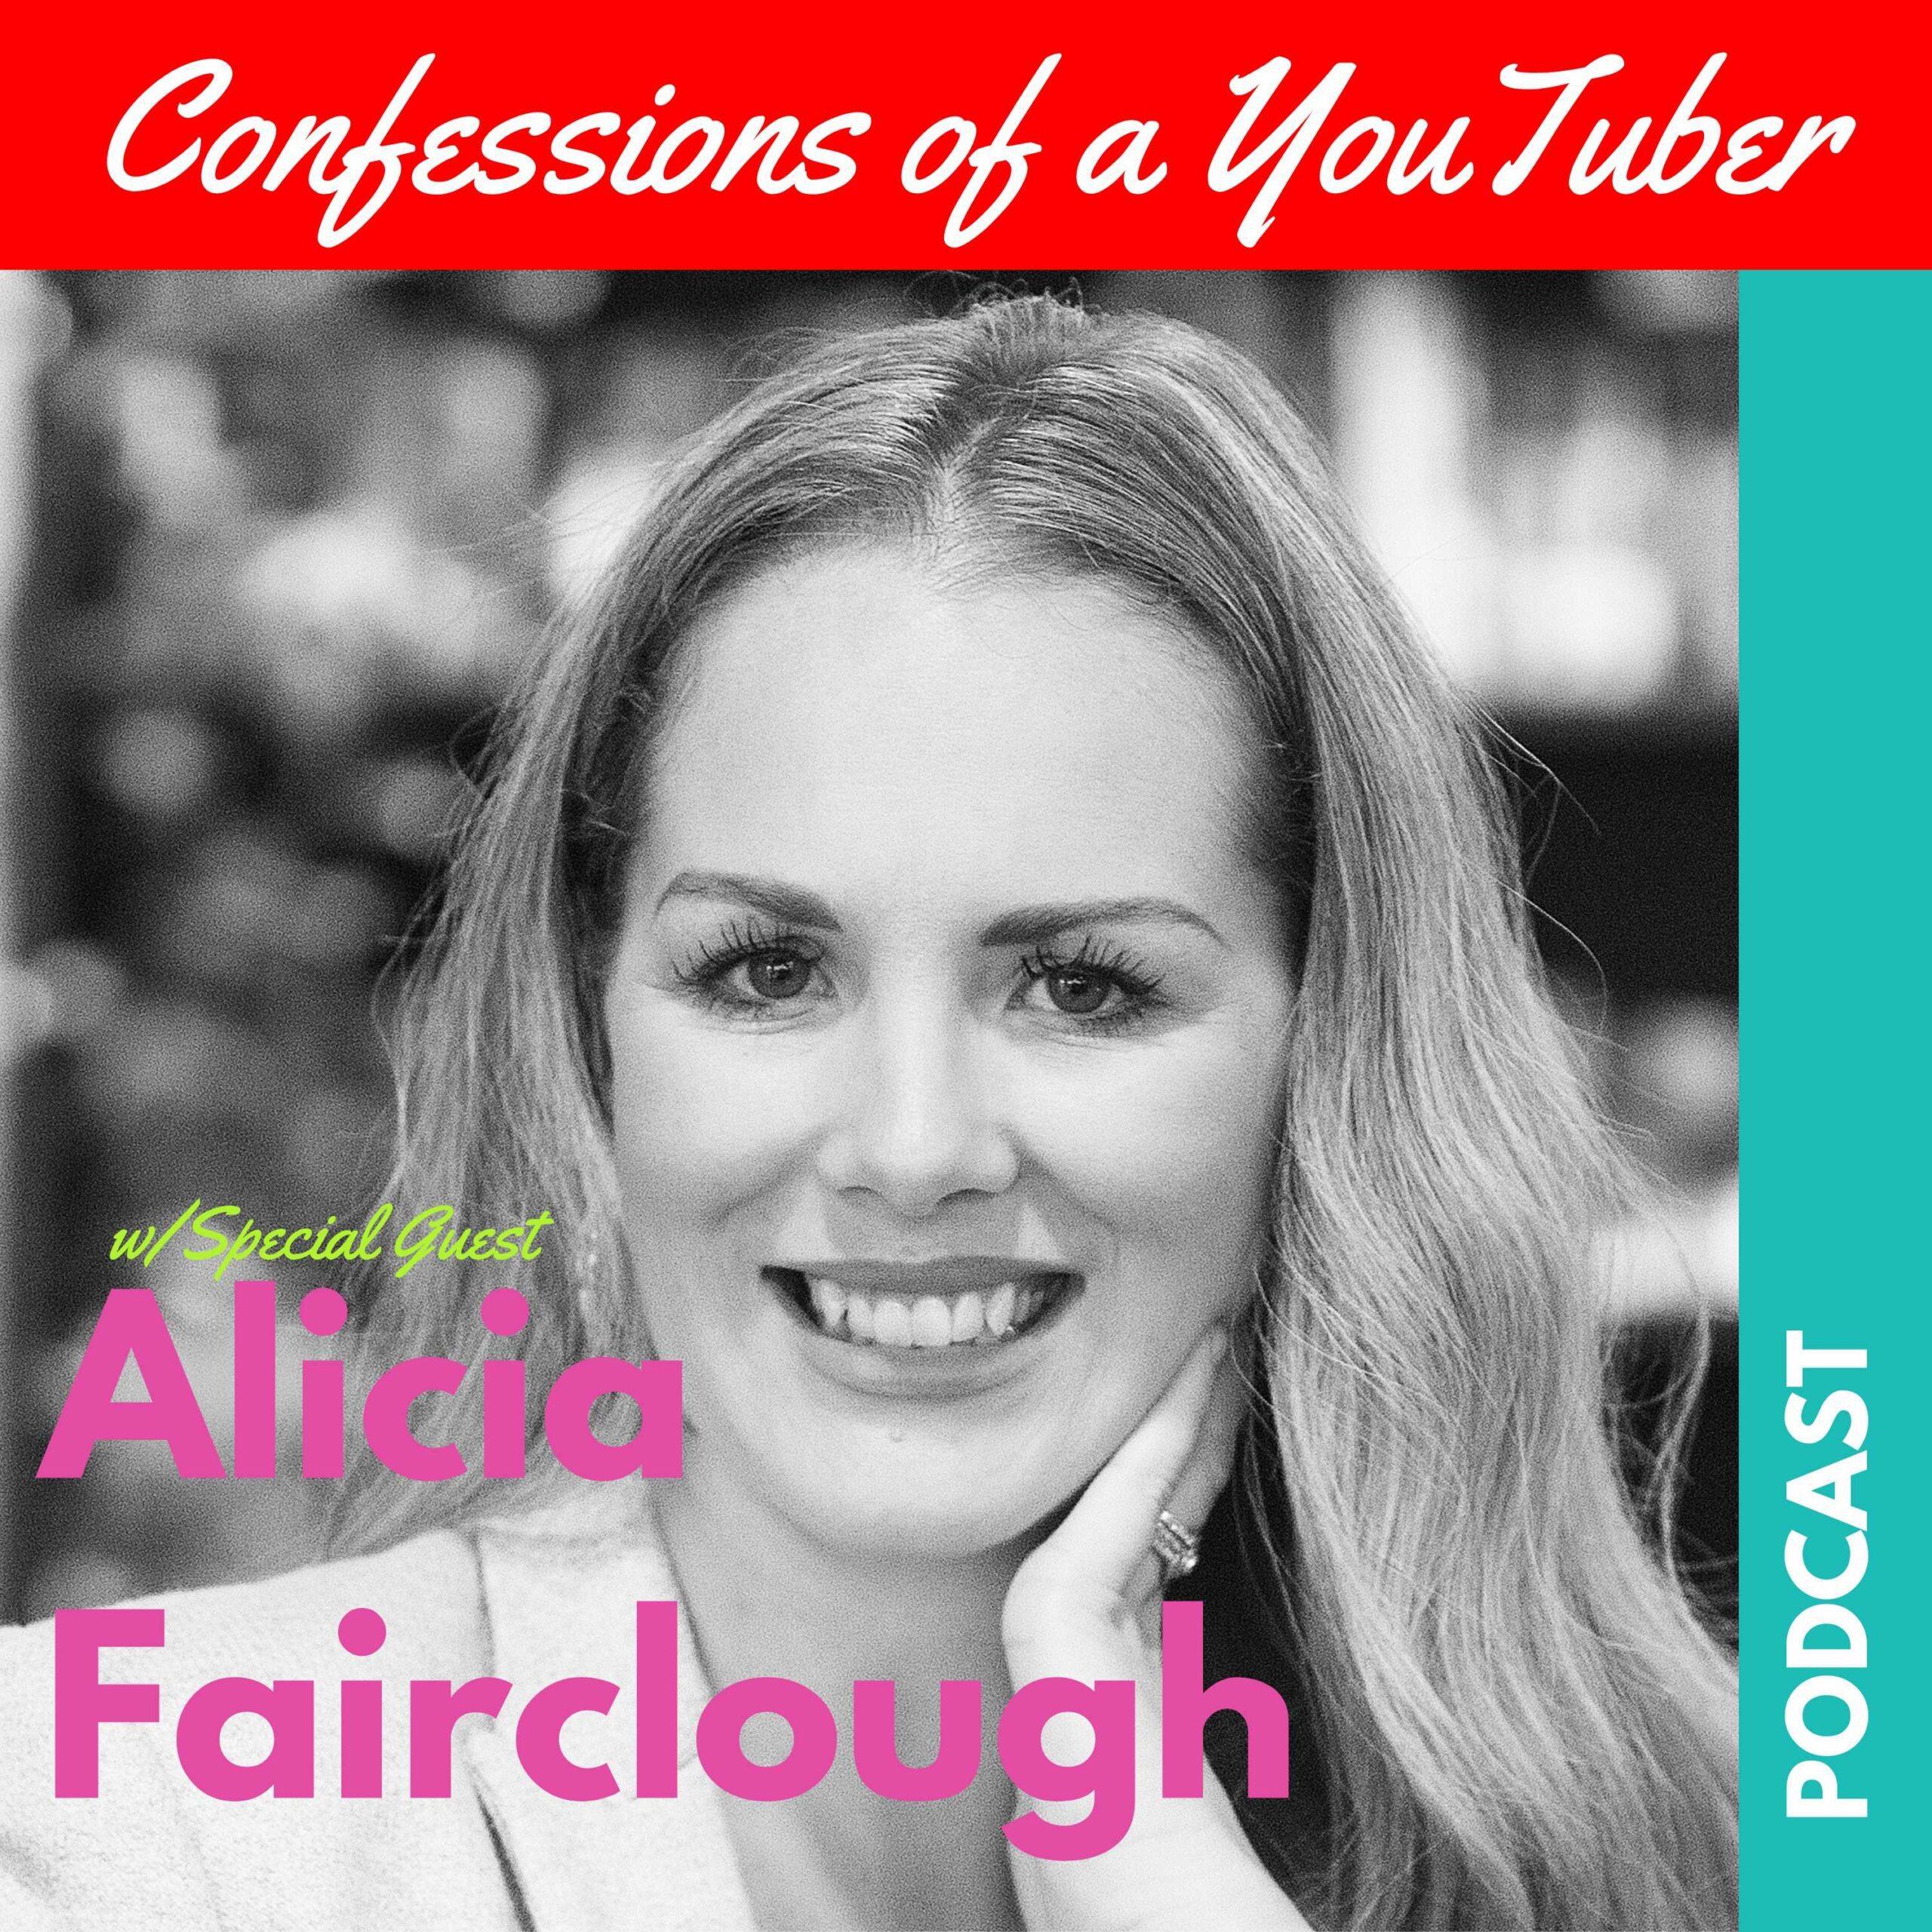 Alicia Fairclough Podcast